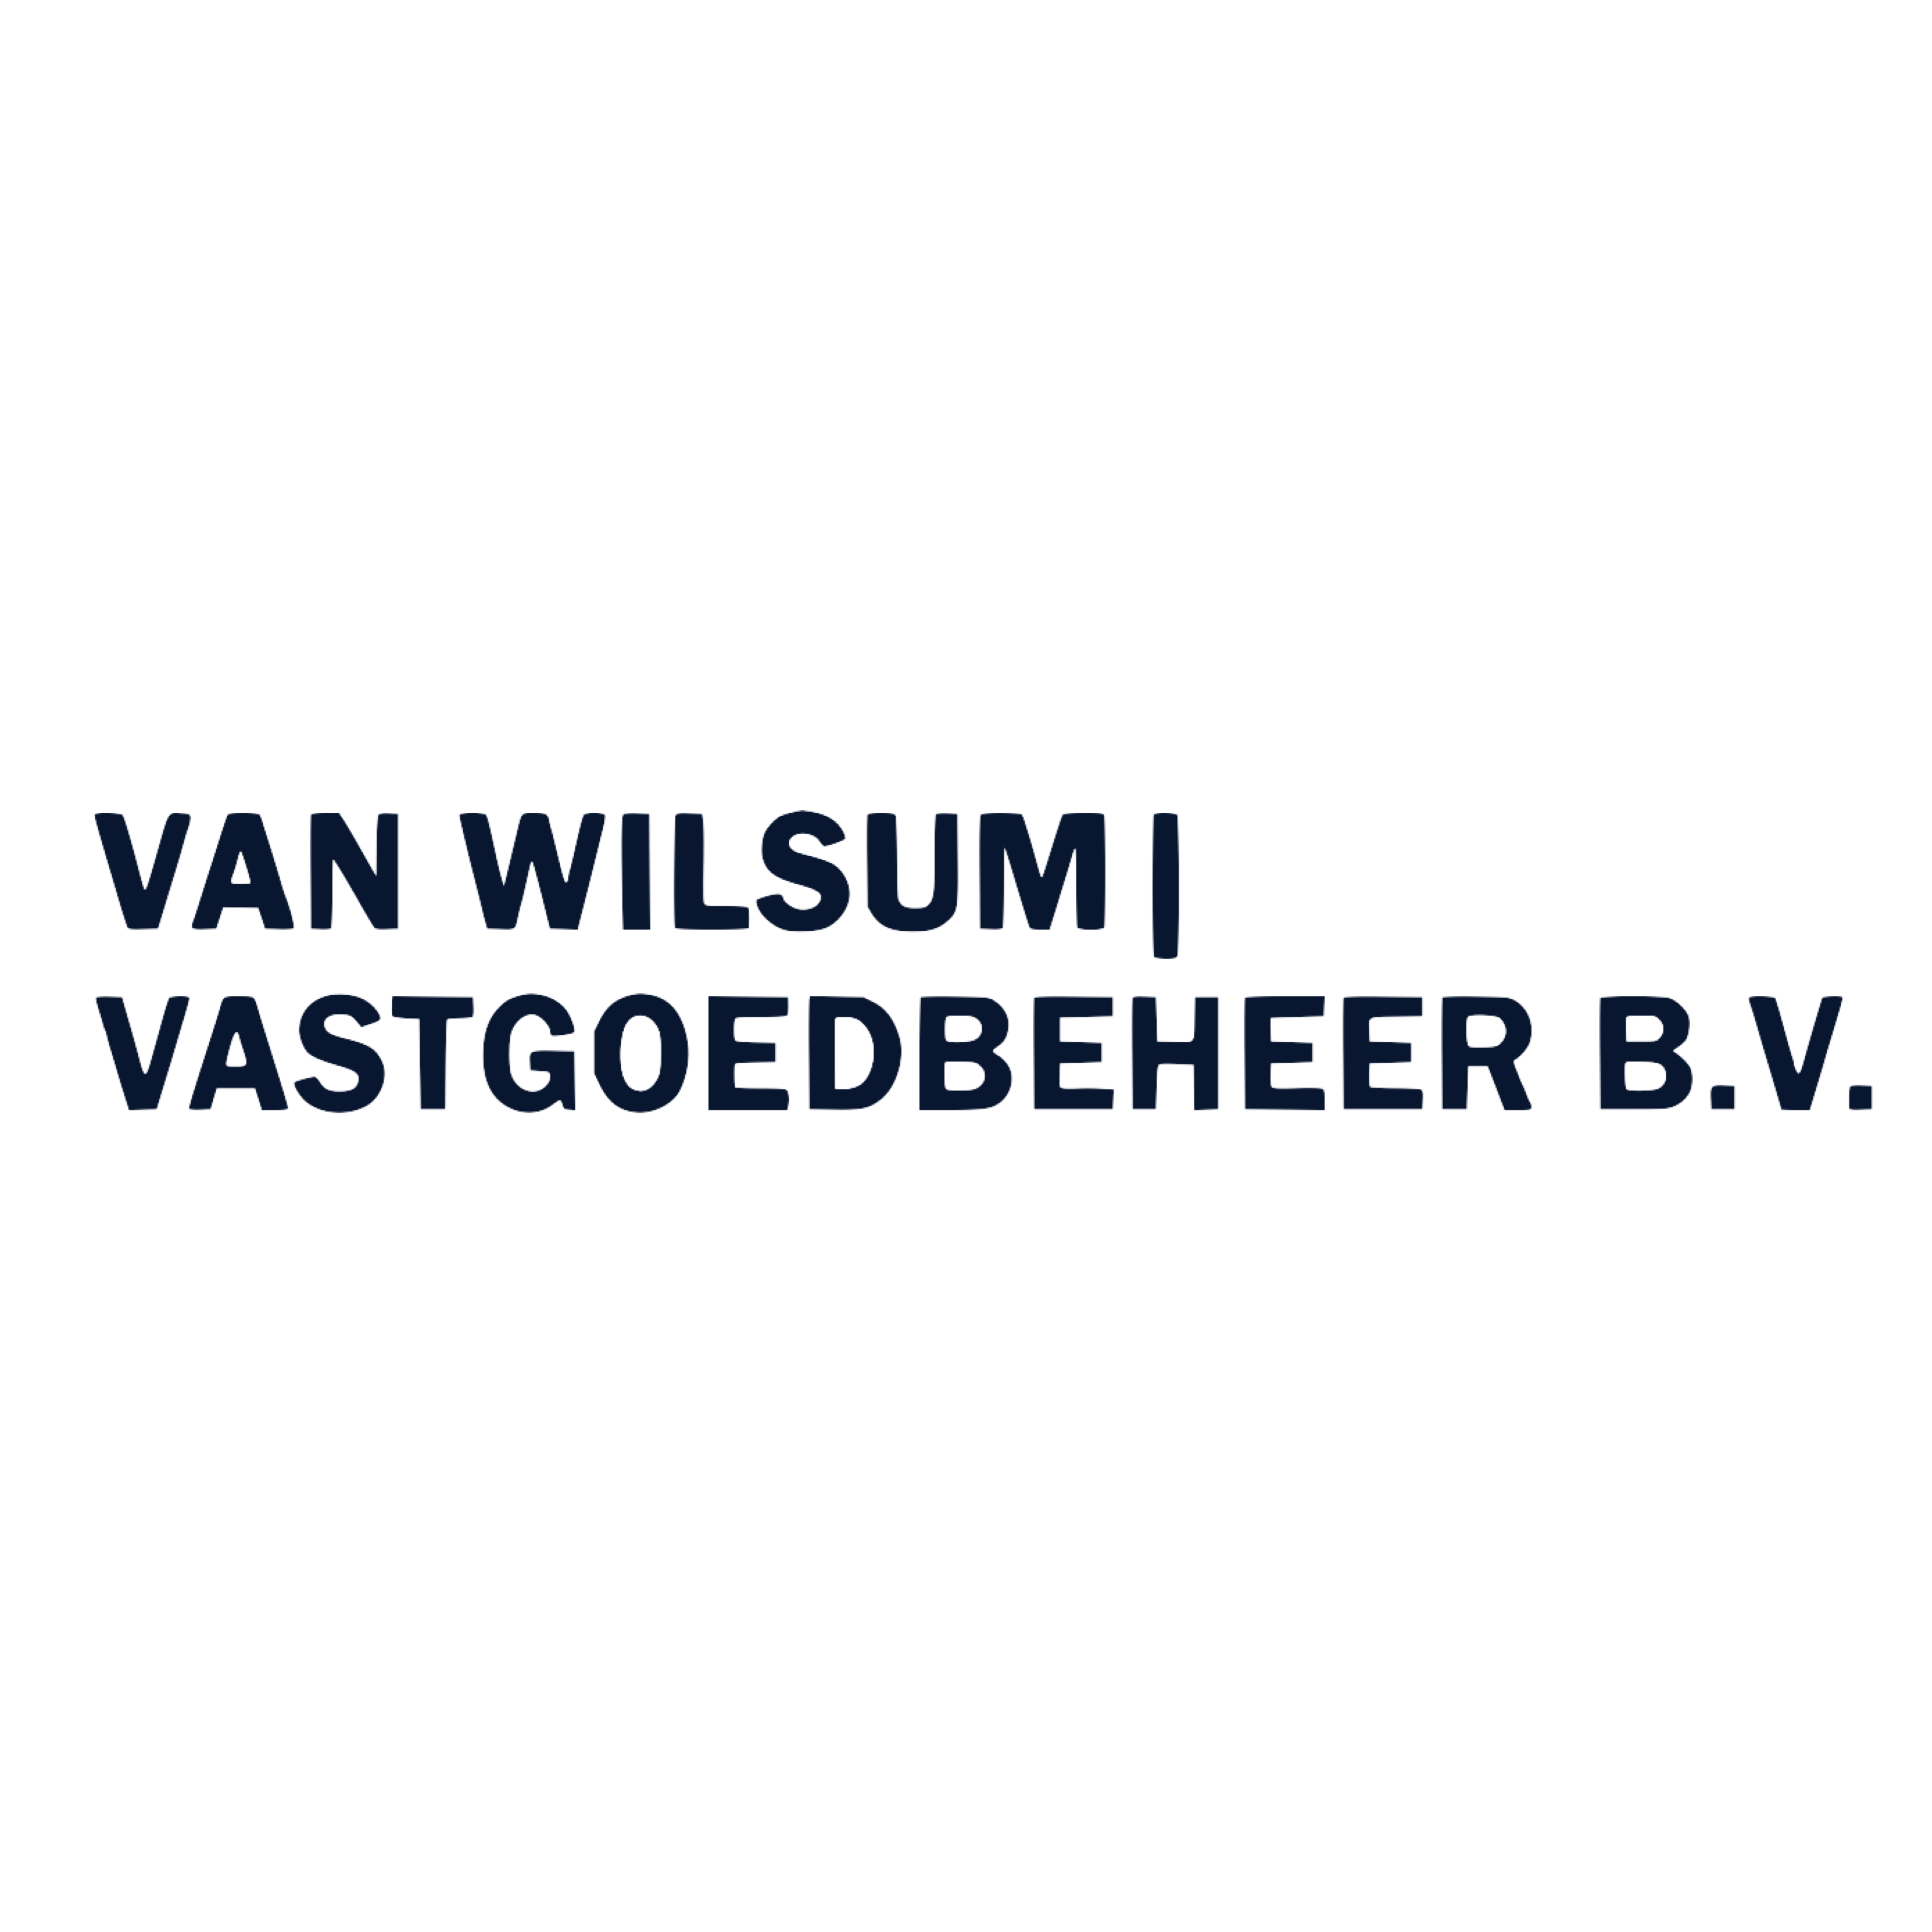 Logo VW Vastgoed